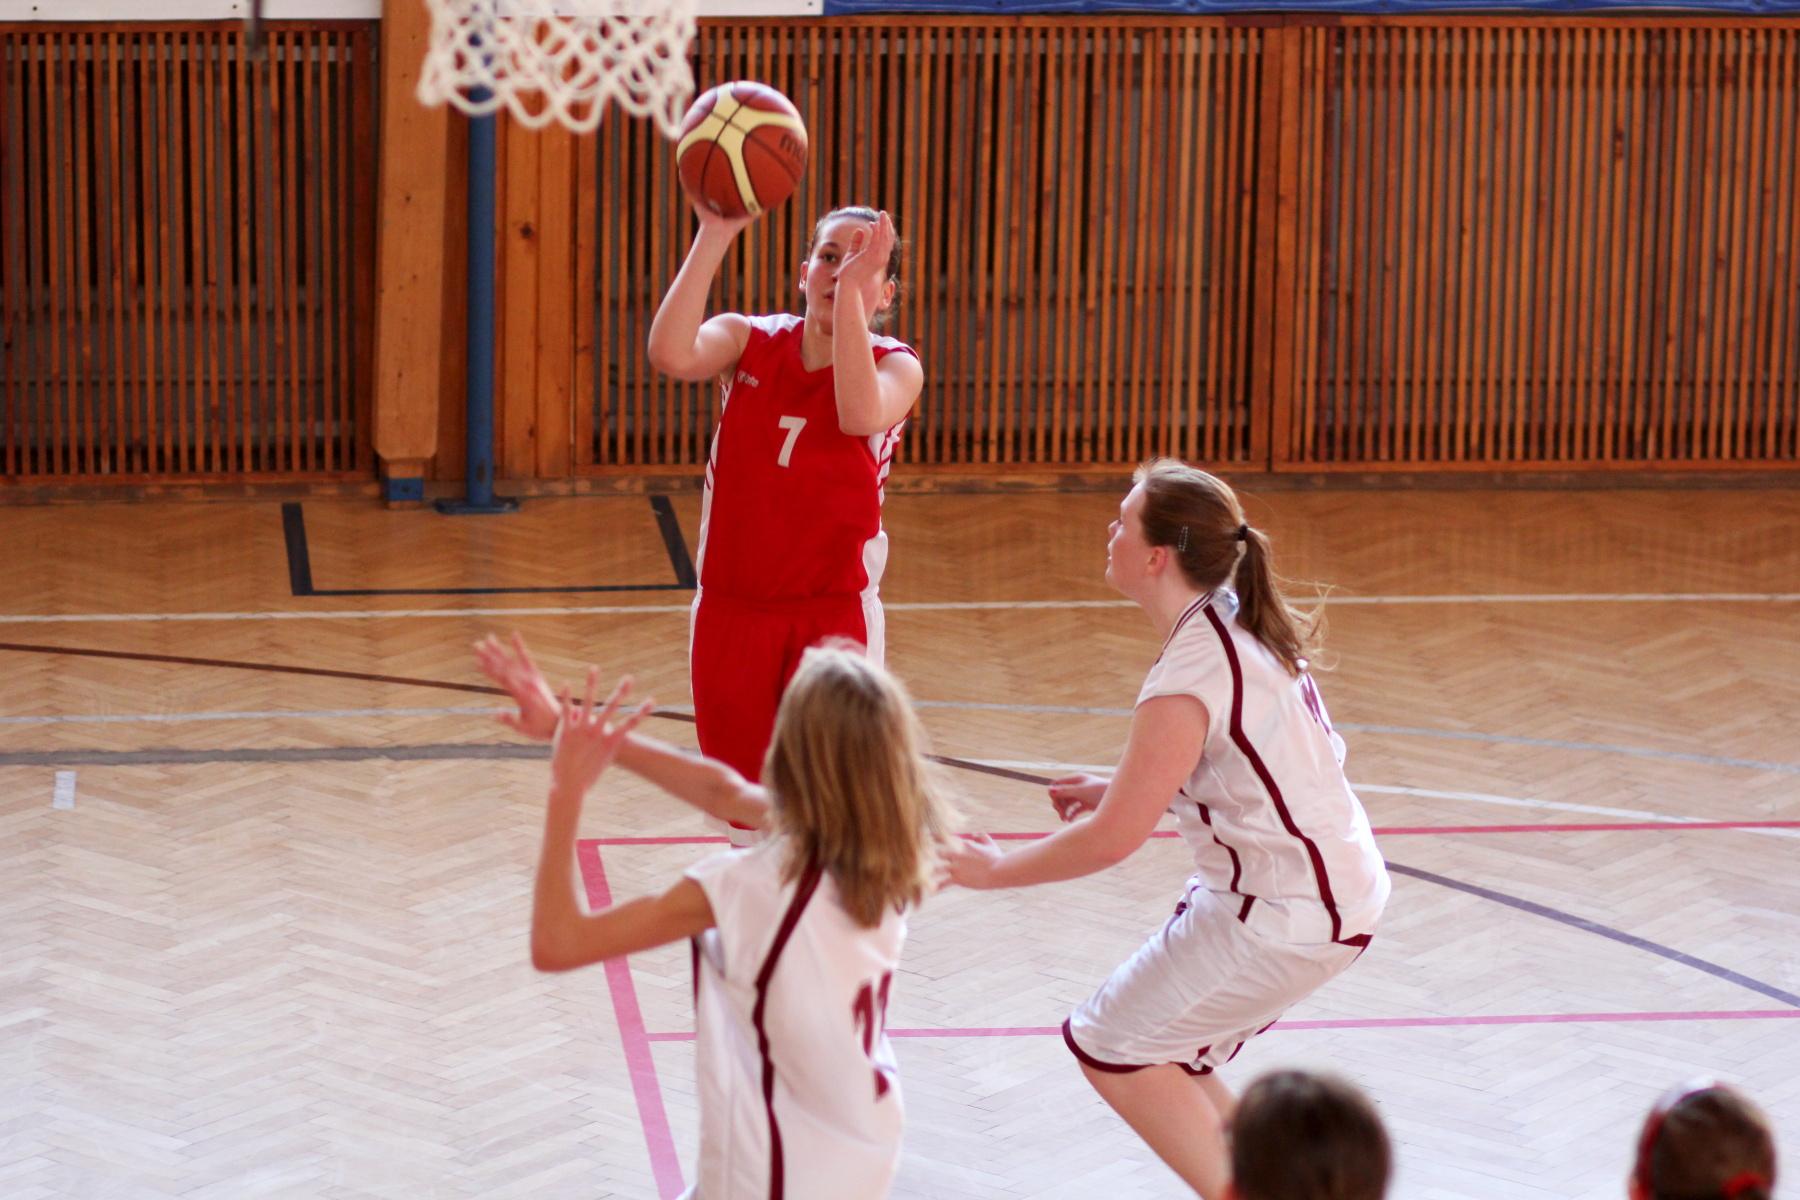 zvolen-bystrica-ziacky-basketbal-16